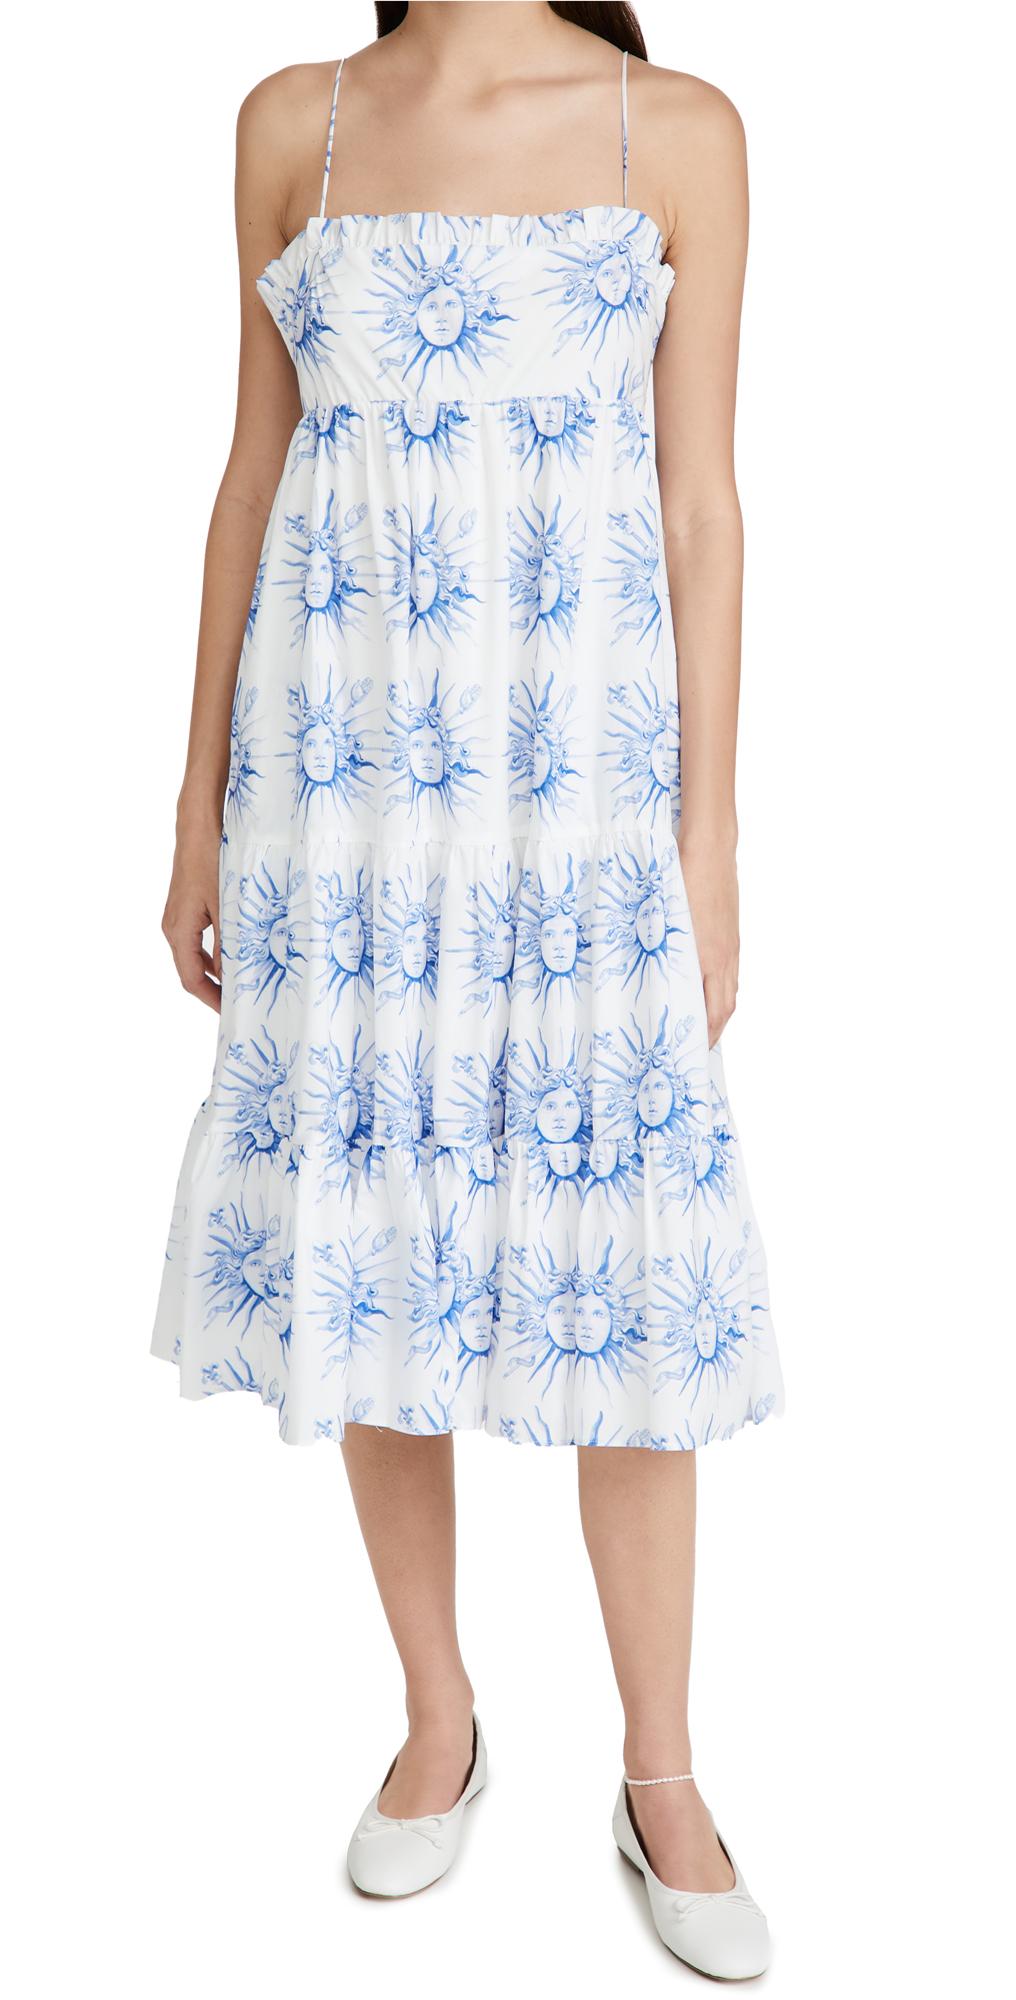 Tarilyn Dress